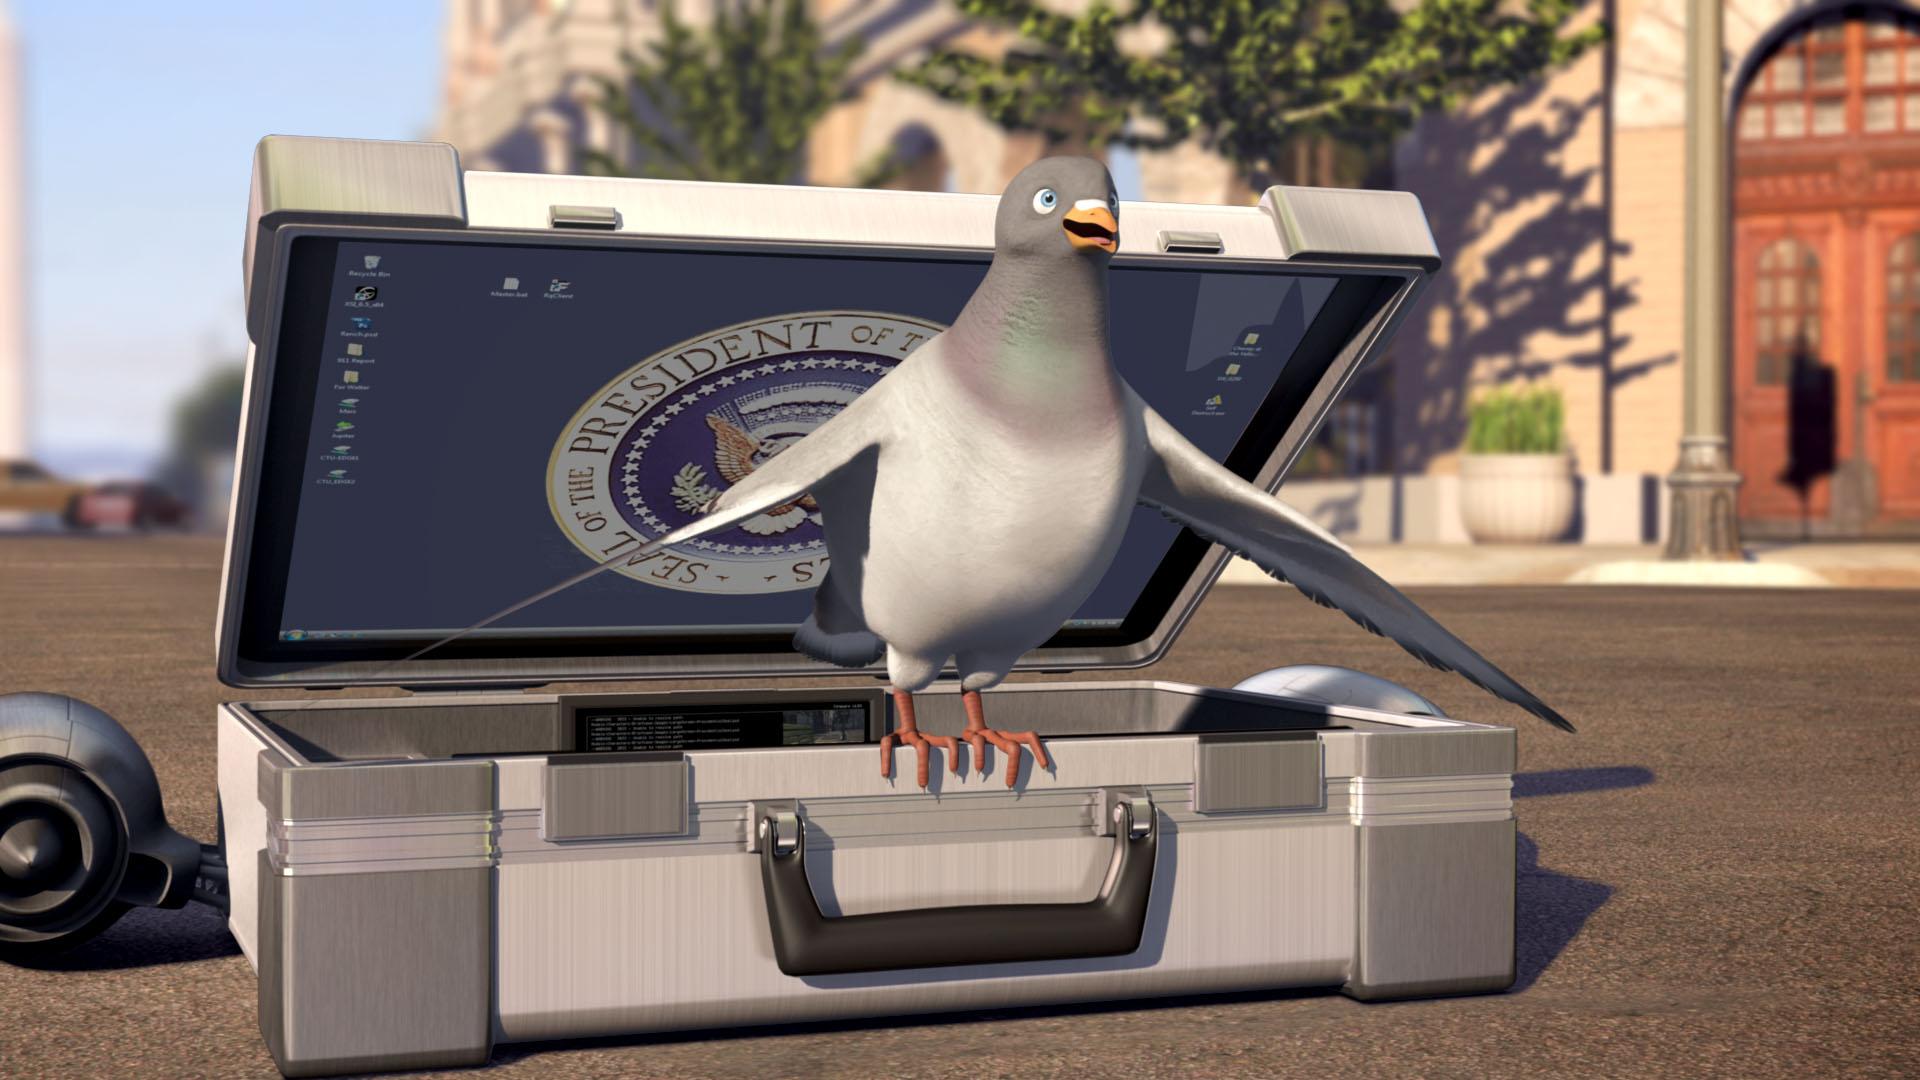 PigeonImpossible.jpg